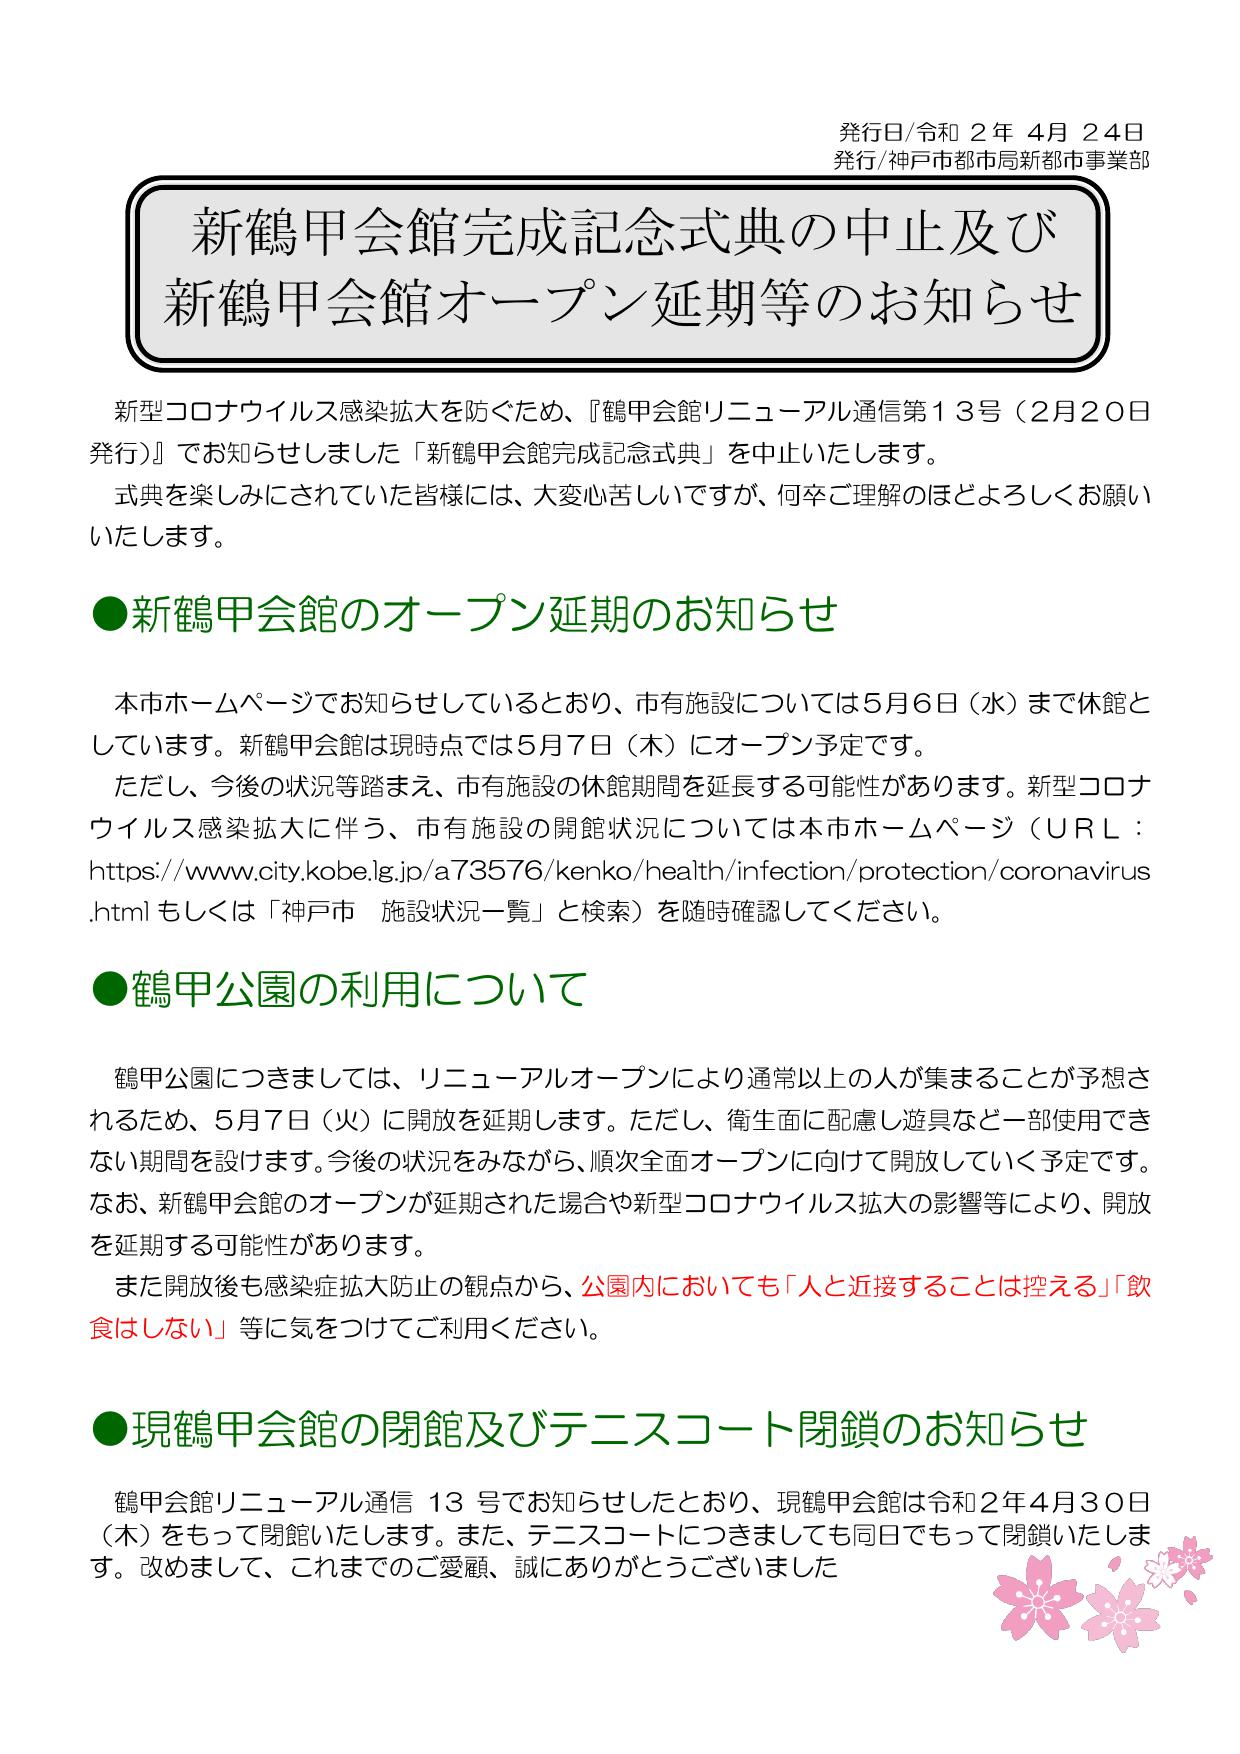 完成記念式典中止案内 (緊急事態宣言を受けて)_000001